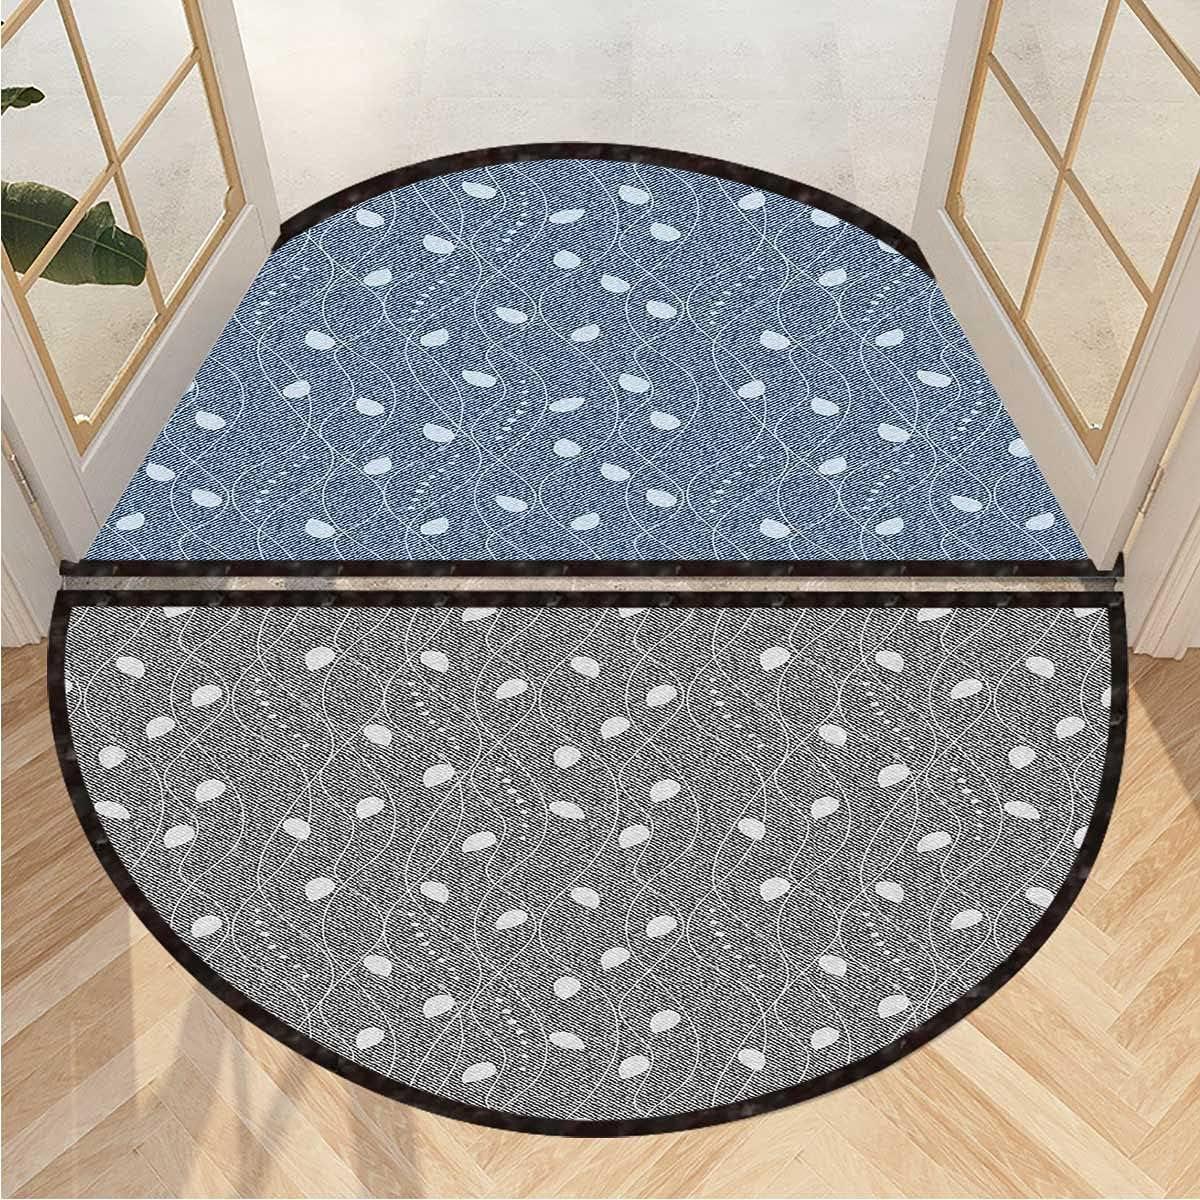 All stores are sold Semicircular Floor Mat Branches Over Indoor Outdo Denim Door Max 66% OFF